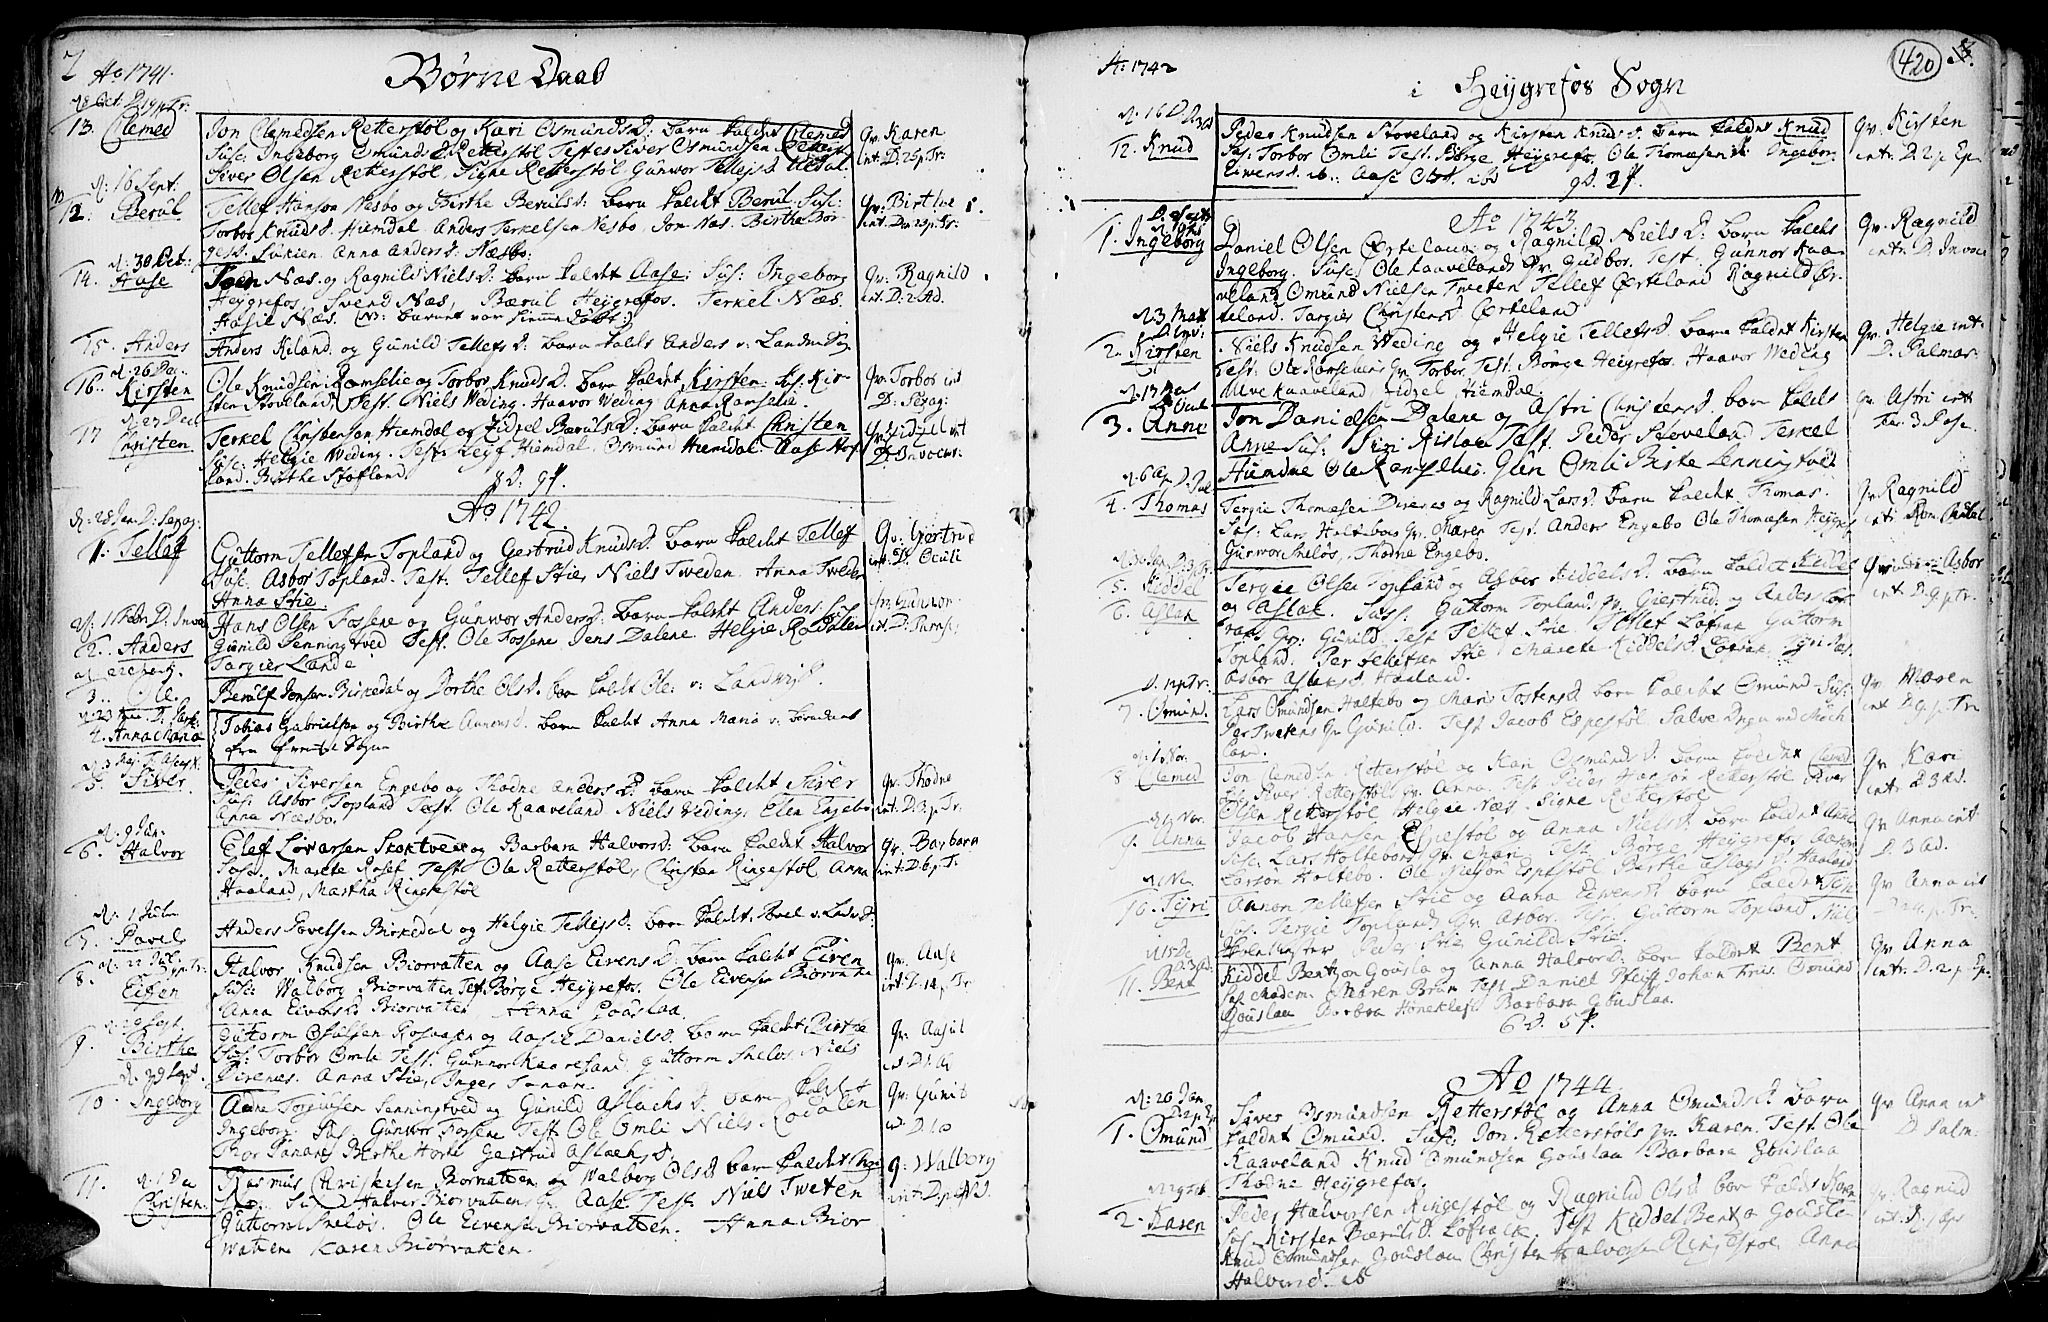 SAK, Hommedal sokneprestkontor, F/Fa/Fab/L0002: Ministerialbok nr. A 2 /3, 1740-1821, s. 420